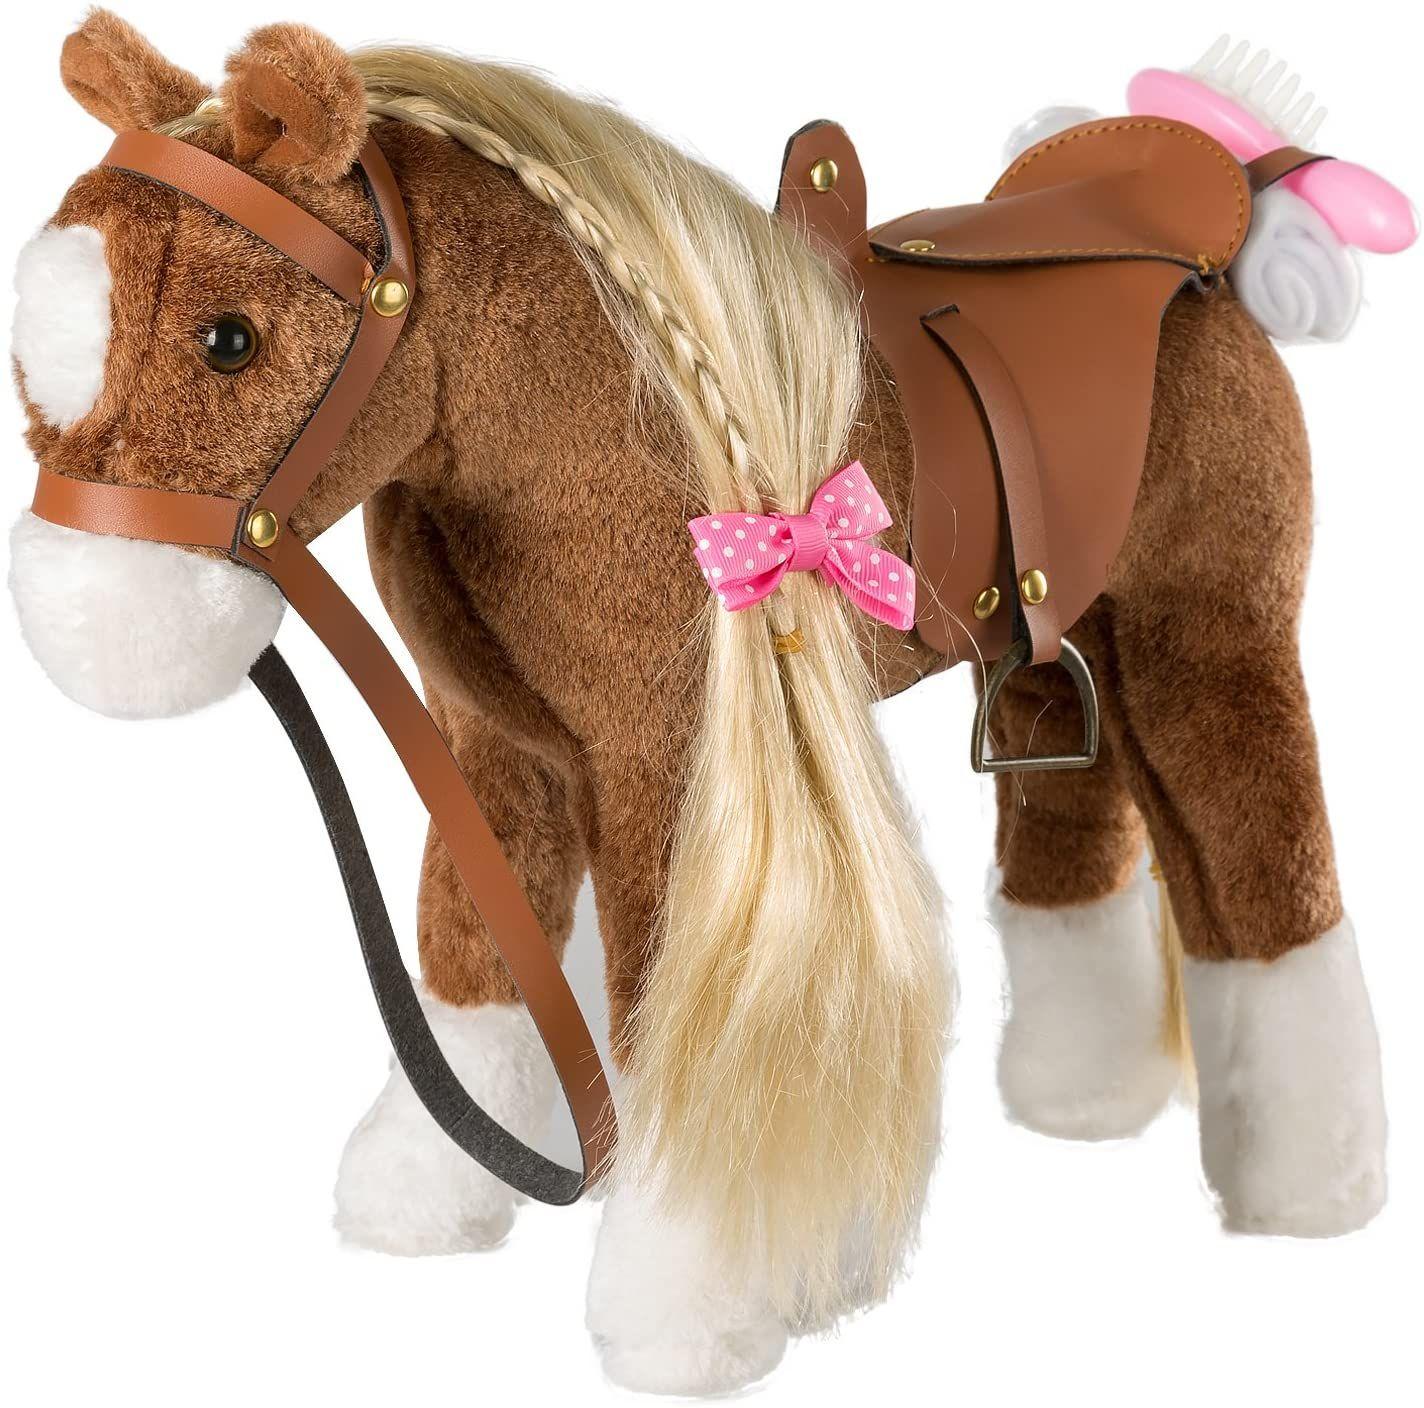 HollyHOME Stuffed Animal Unicorn Horse Pretty Plush Unicorn Pony Toy Pretend Play Horse 11 inches White